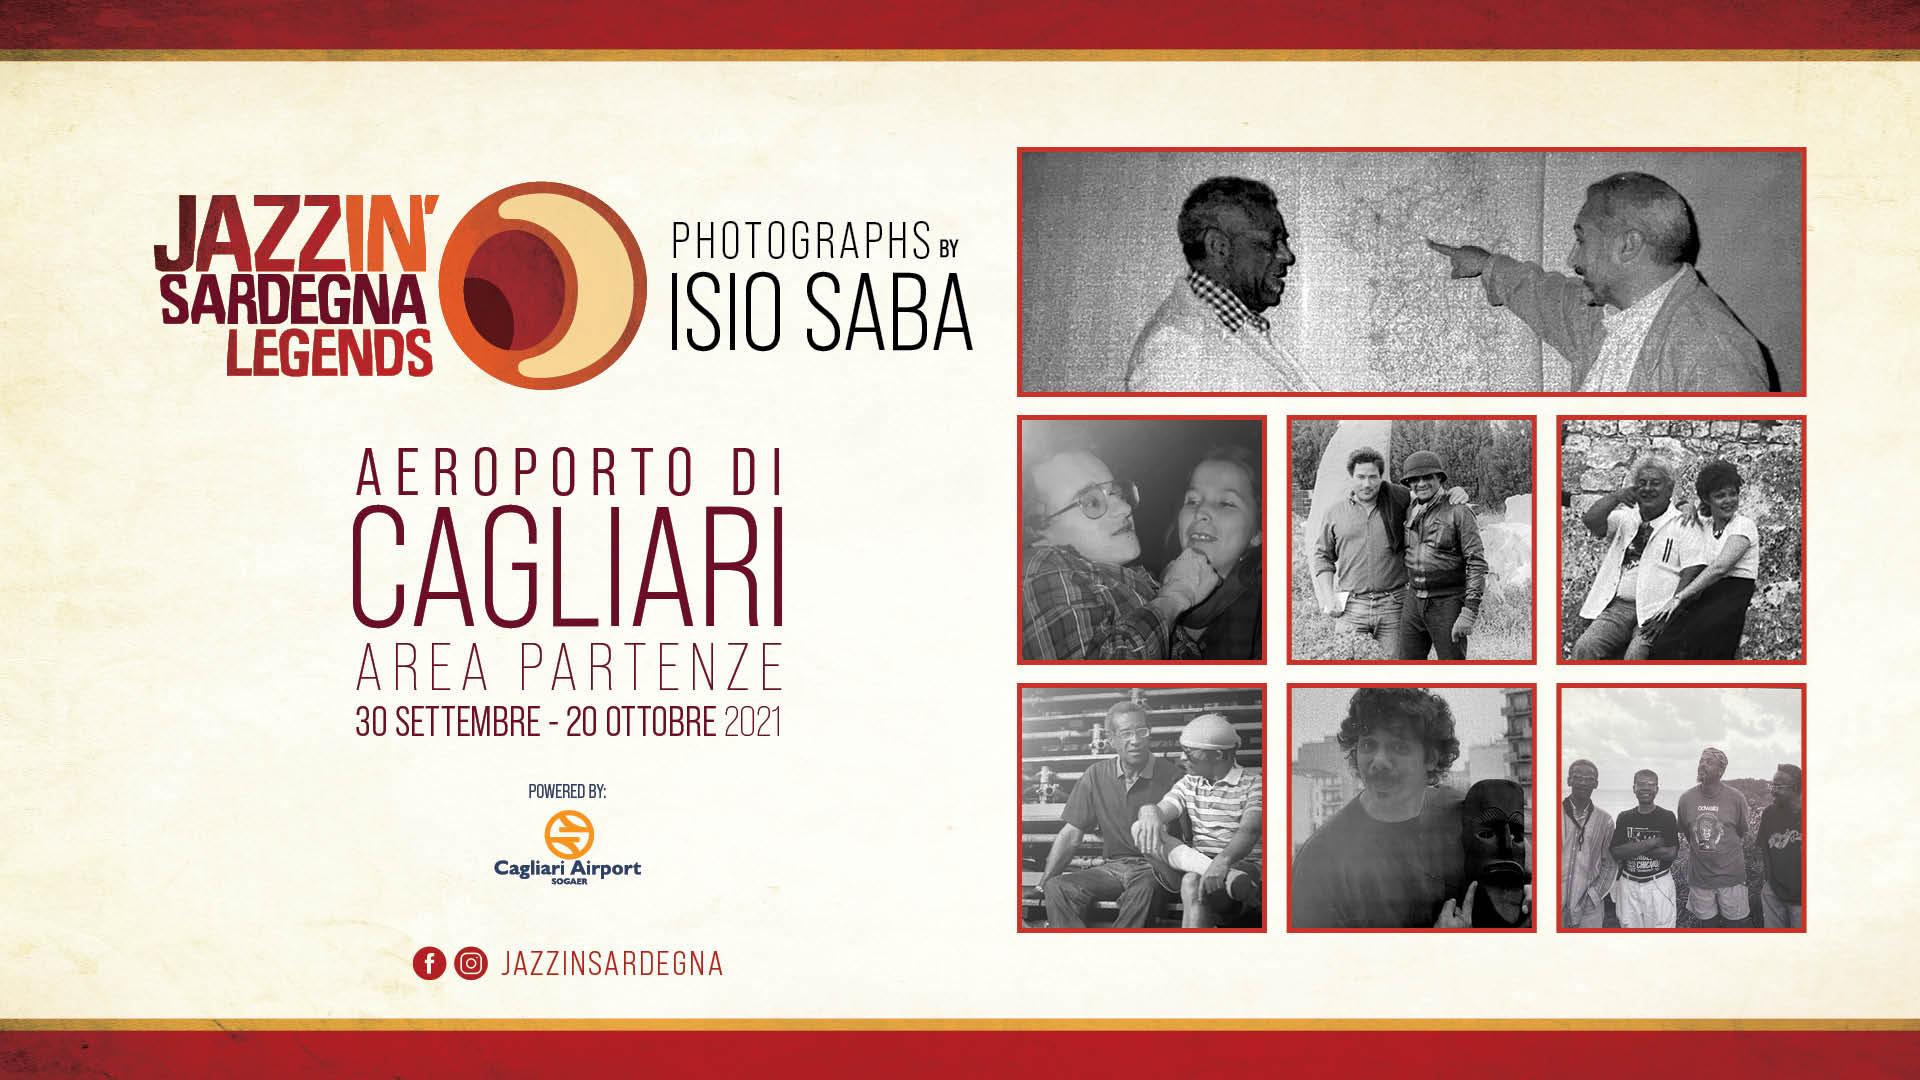 Jazz in Sardegna Legends by Isio Saba